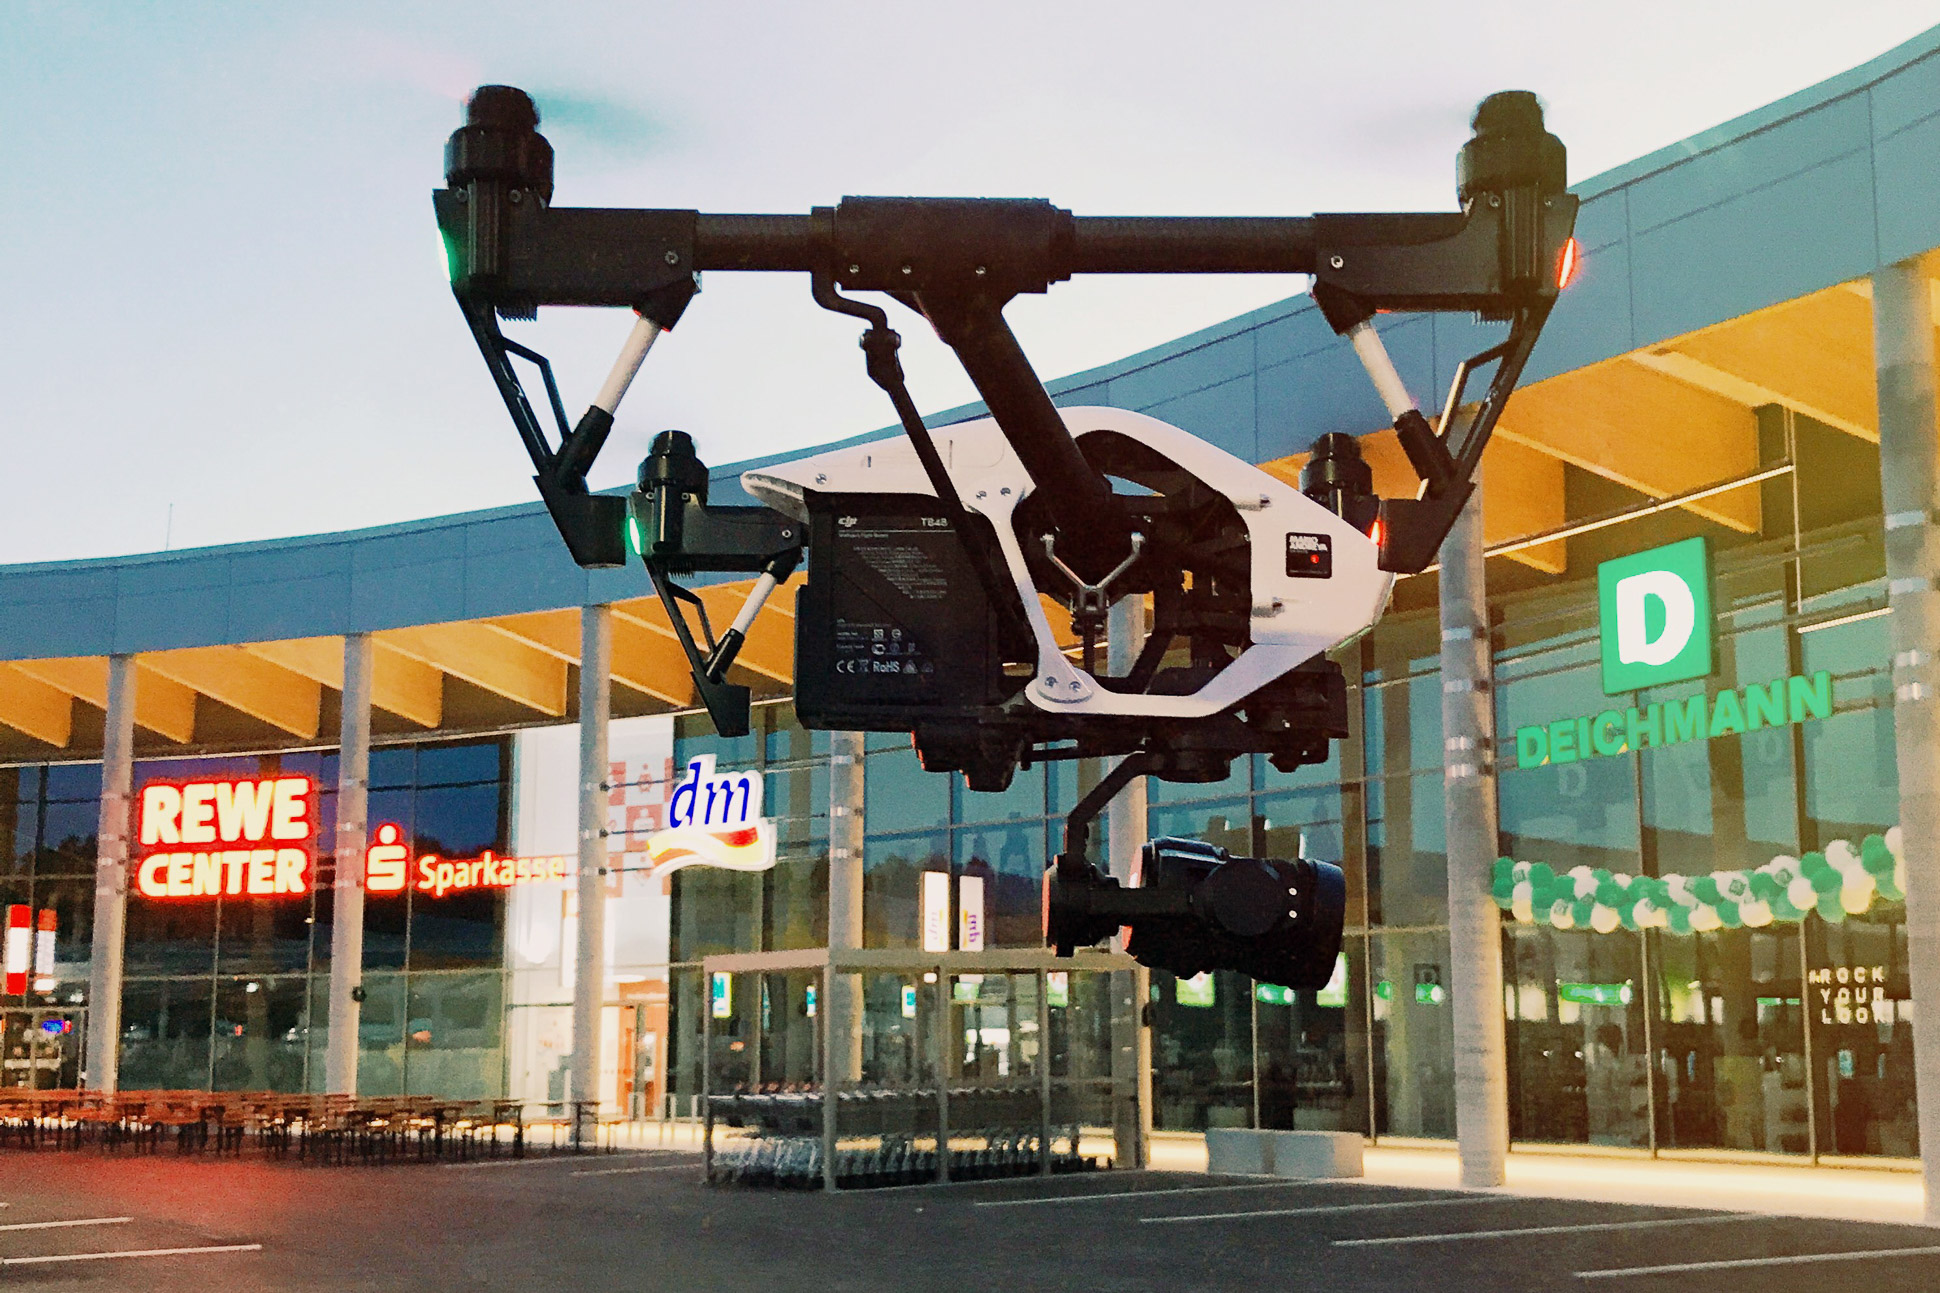 Luftbild Drohne DJI Mavic 2 Pro